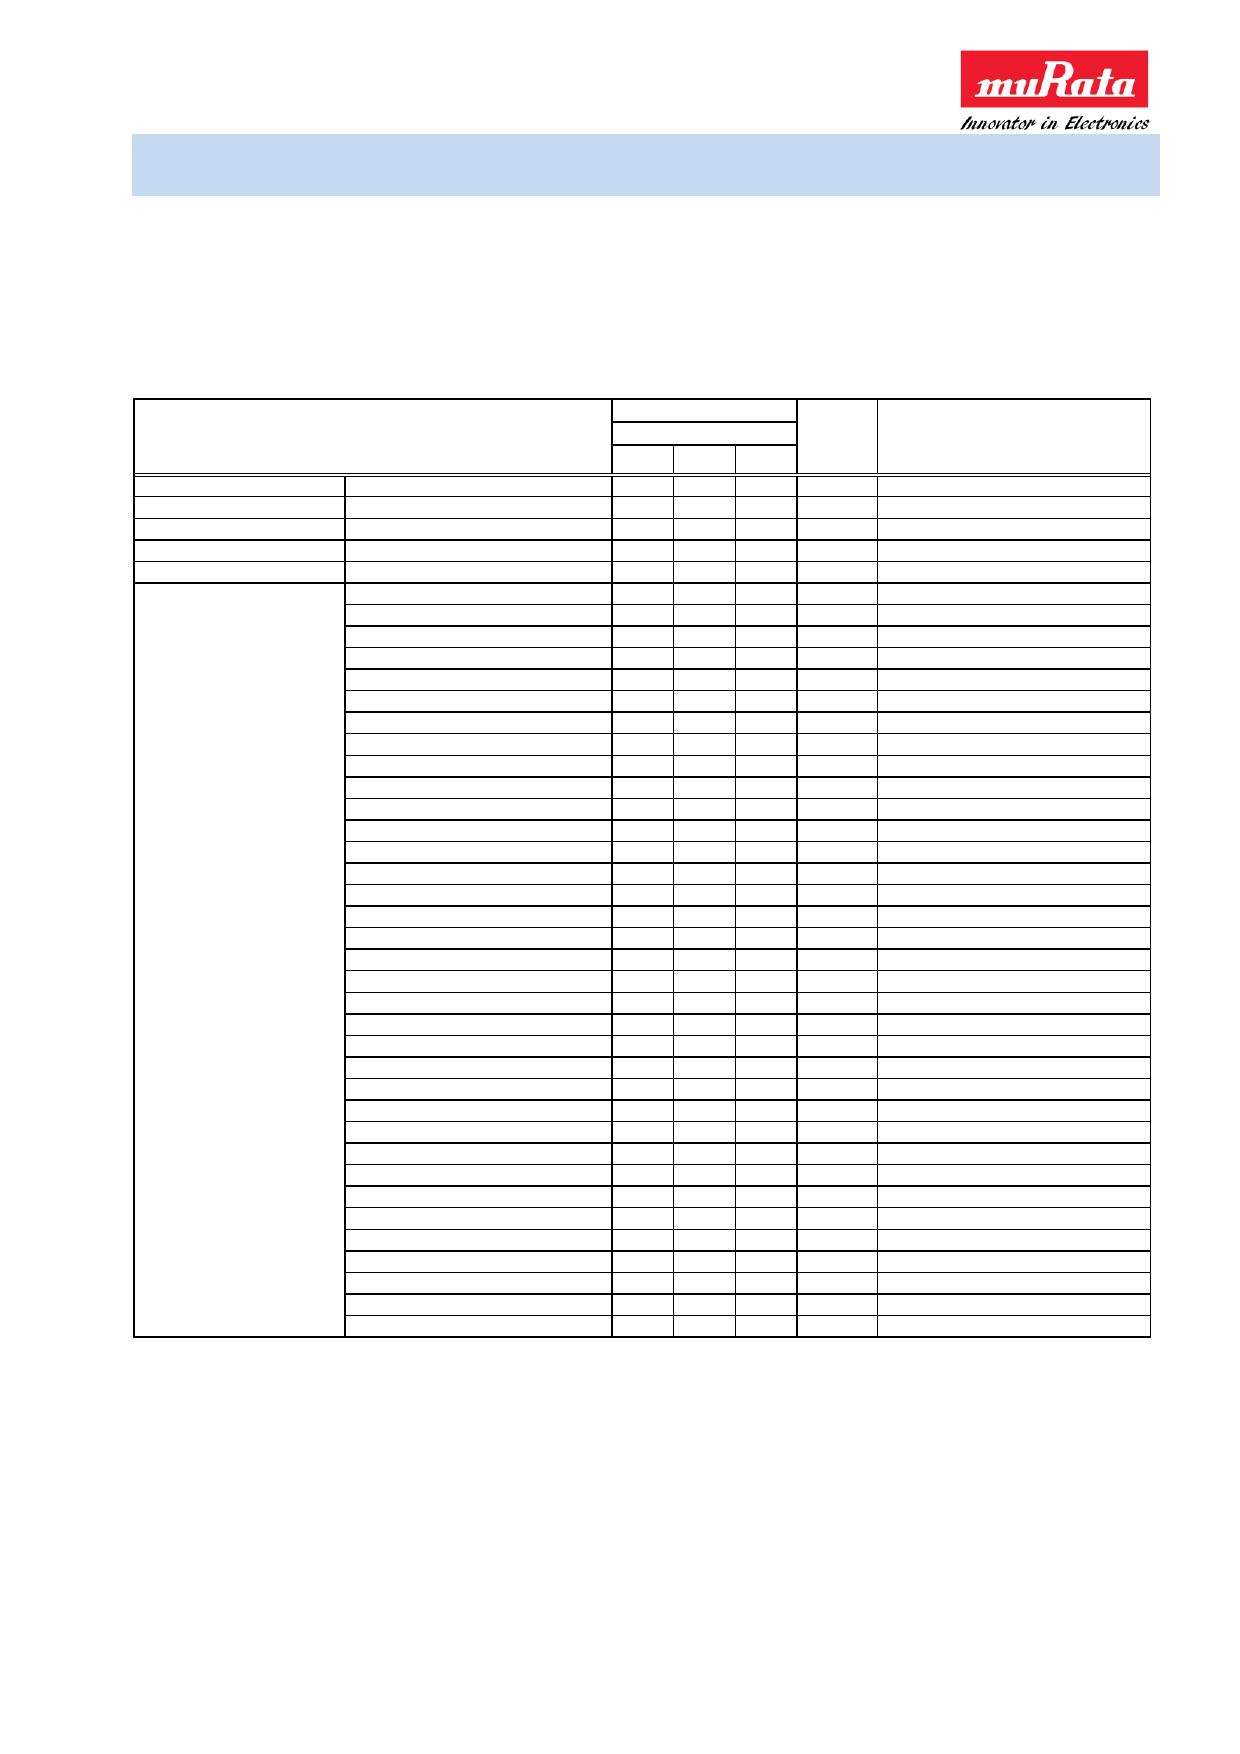 SAFFB751MAA0F0A pdf, 반도체, 판매, 대치품